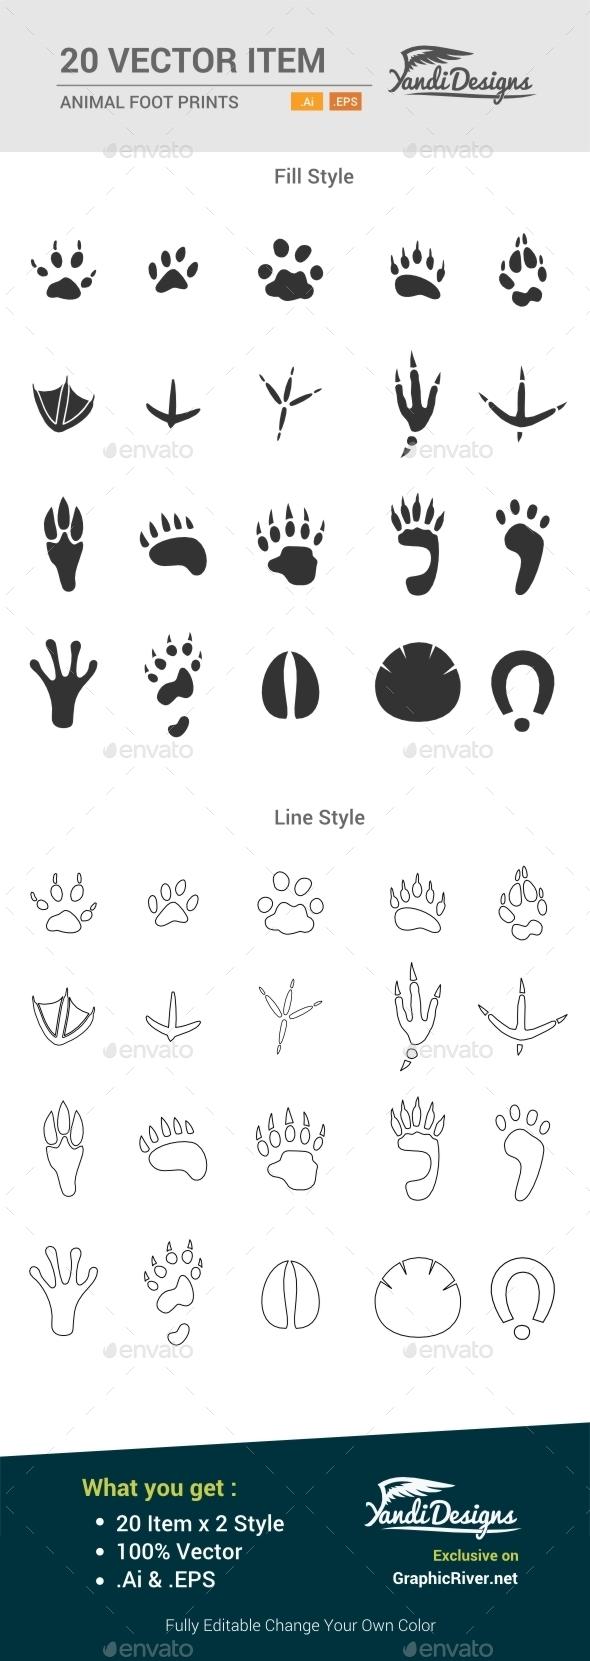 GraphicRiver Animal Foot Prints 10484654